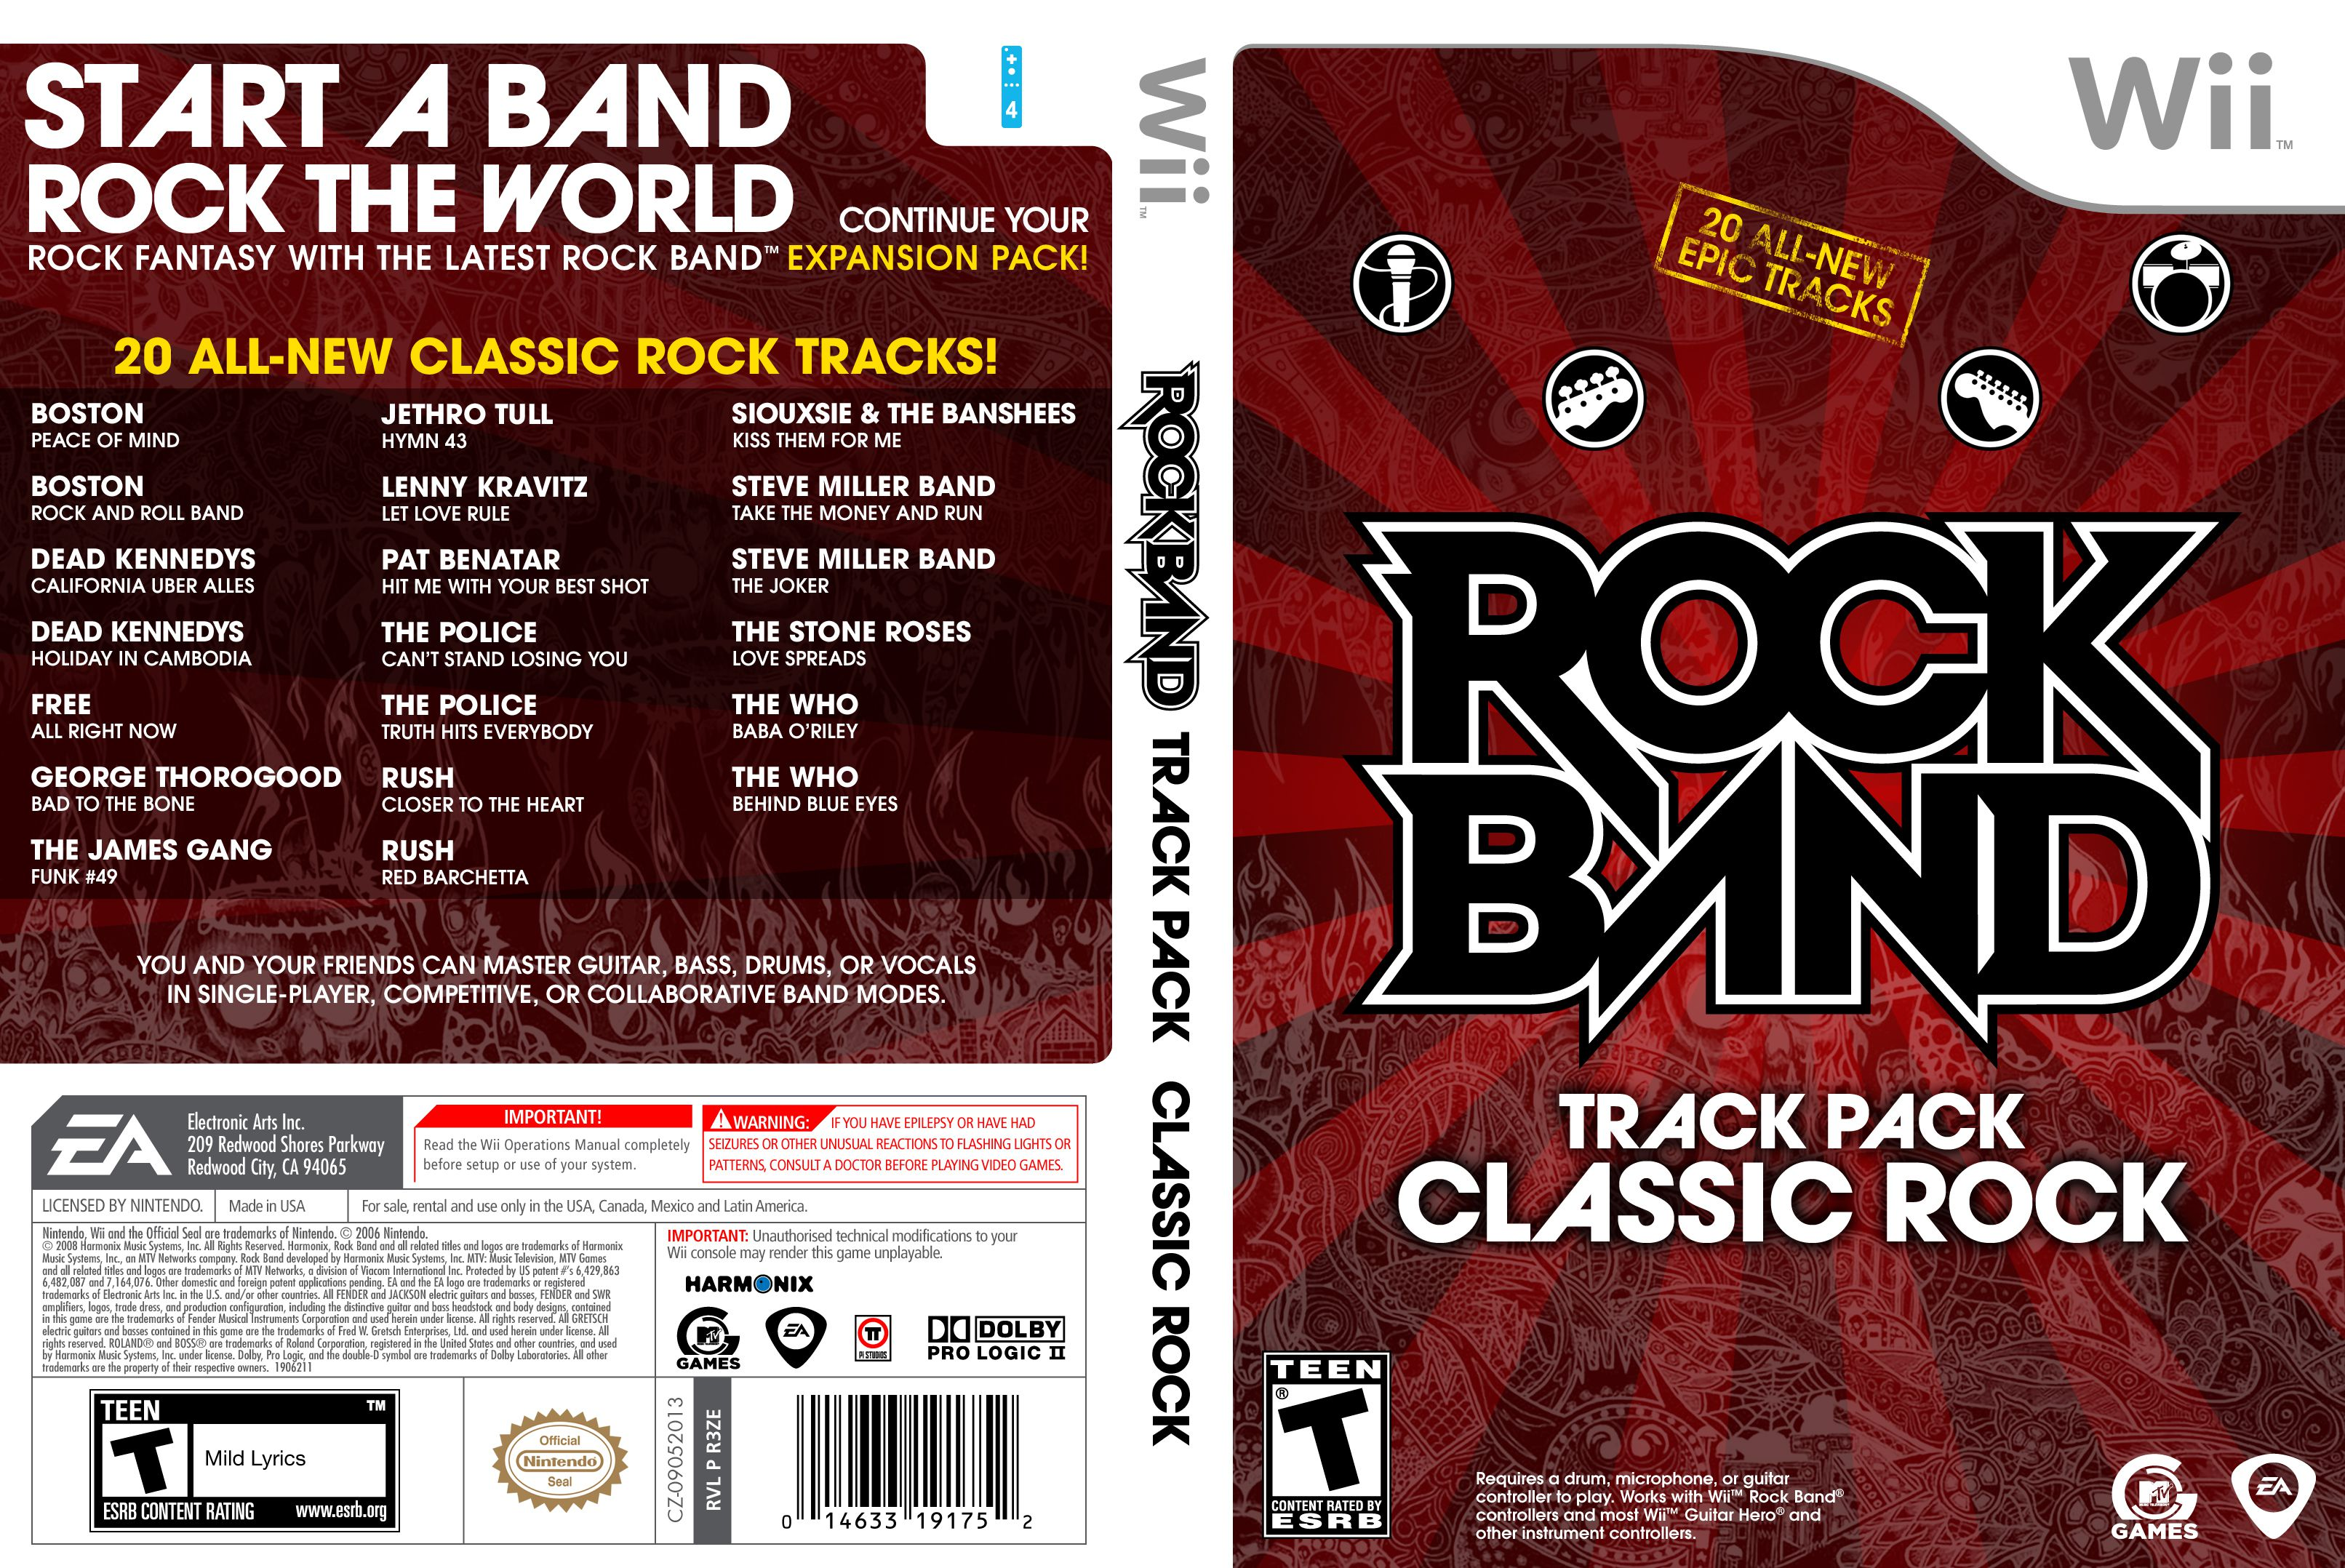 Capa Rock Band Track Pack Classic Rock Wii